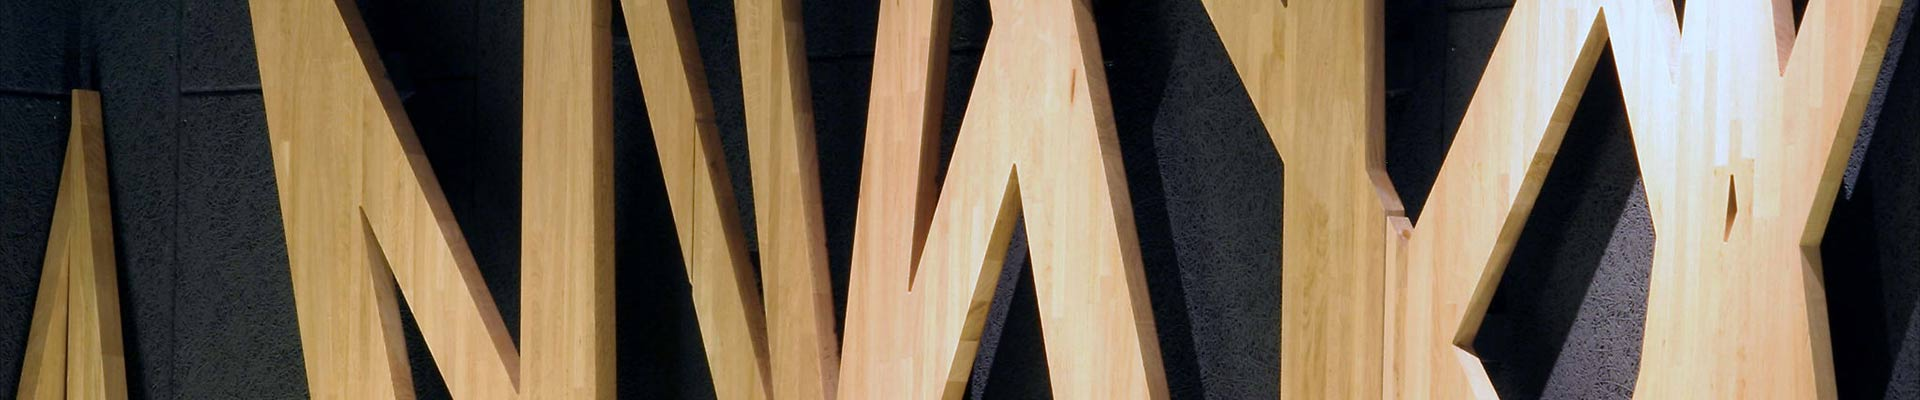 Grupo Gámiz especialistas en proyectos en madera